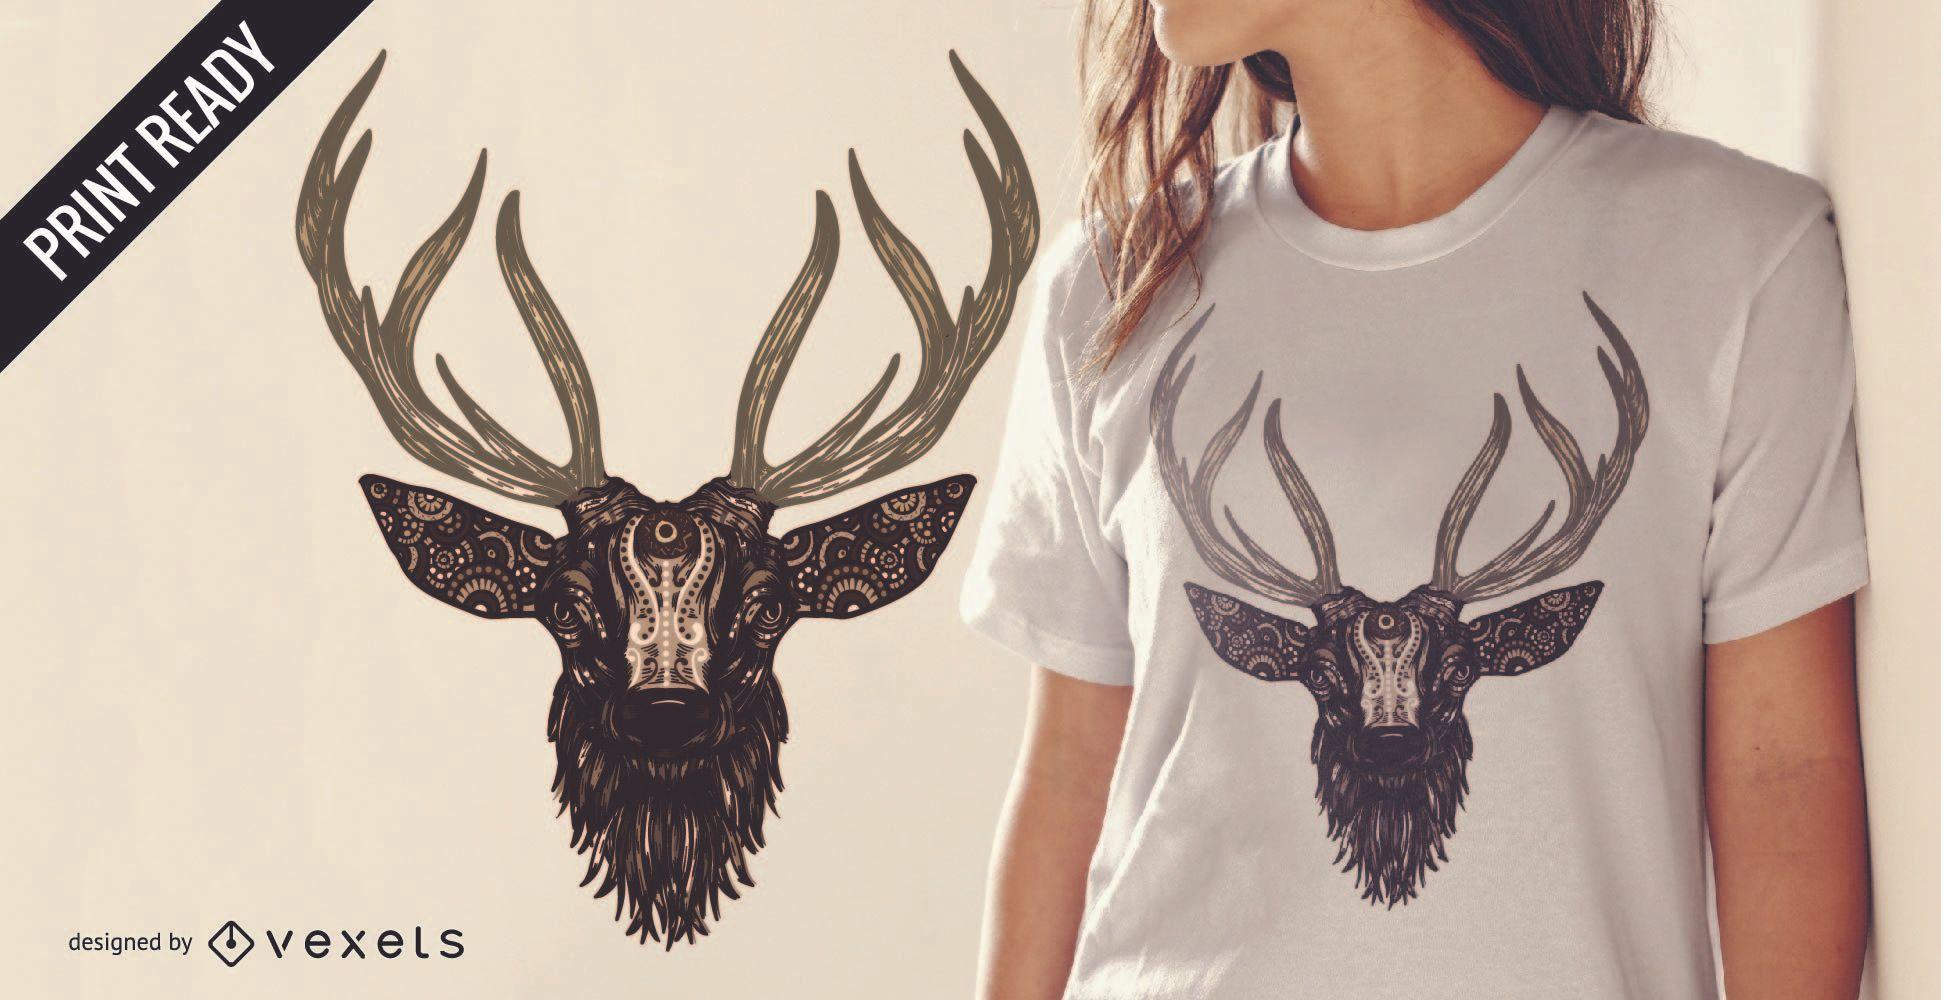 Dise?o ilustrado de camiseta de ciervo.